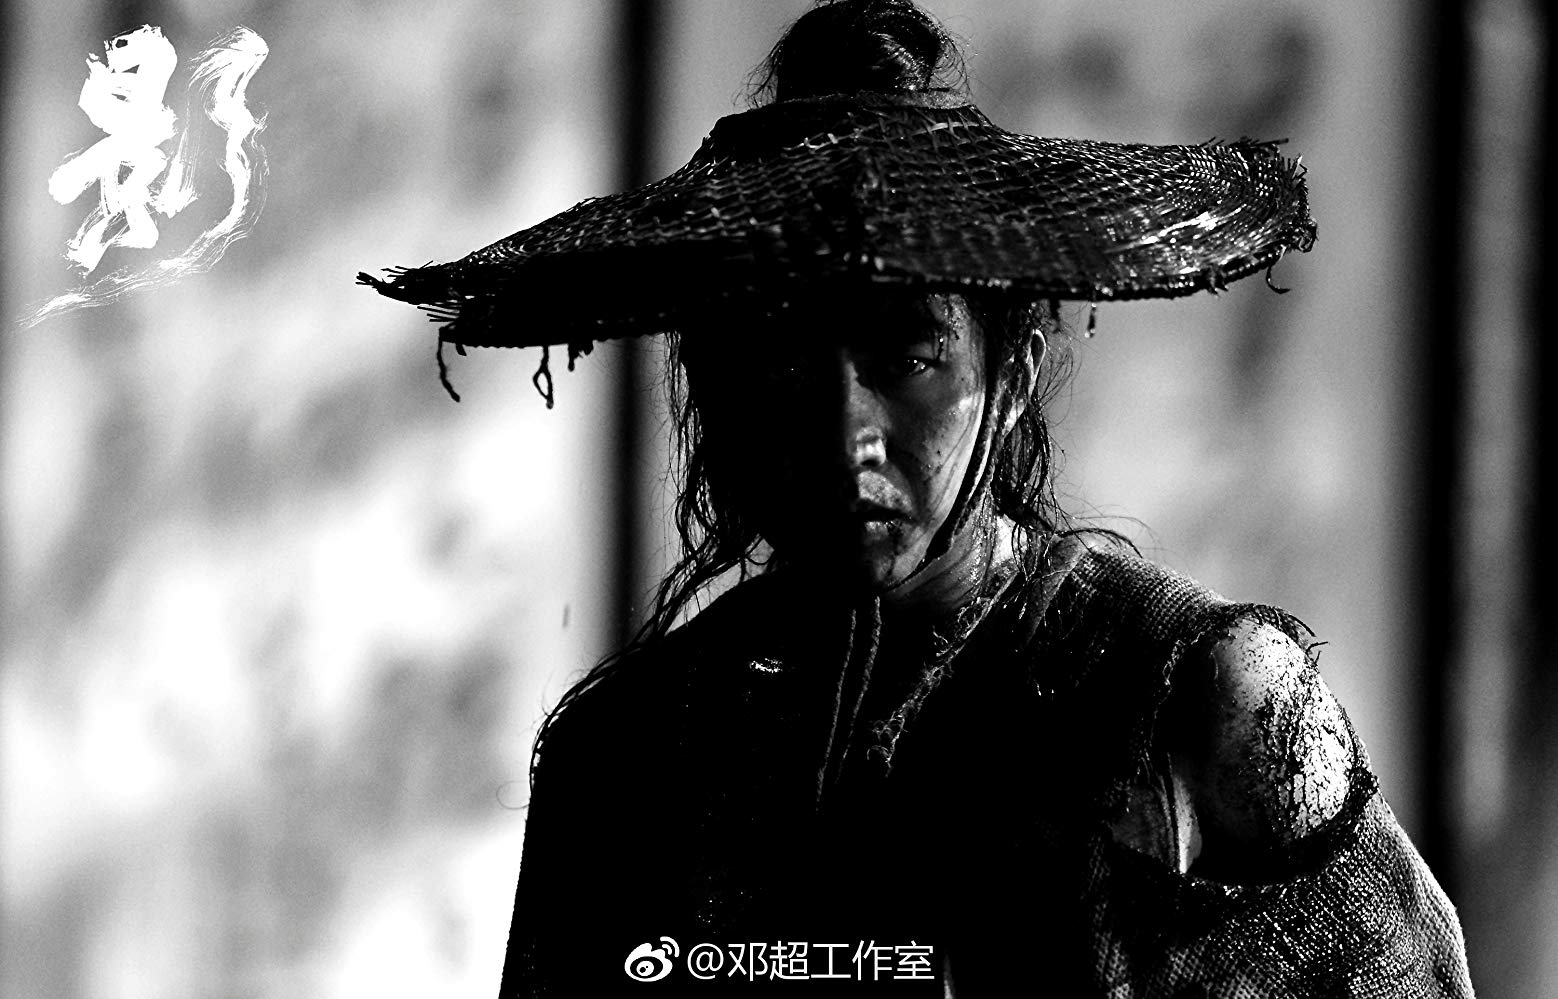 Shadow (Ying)